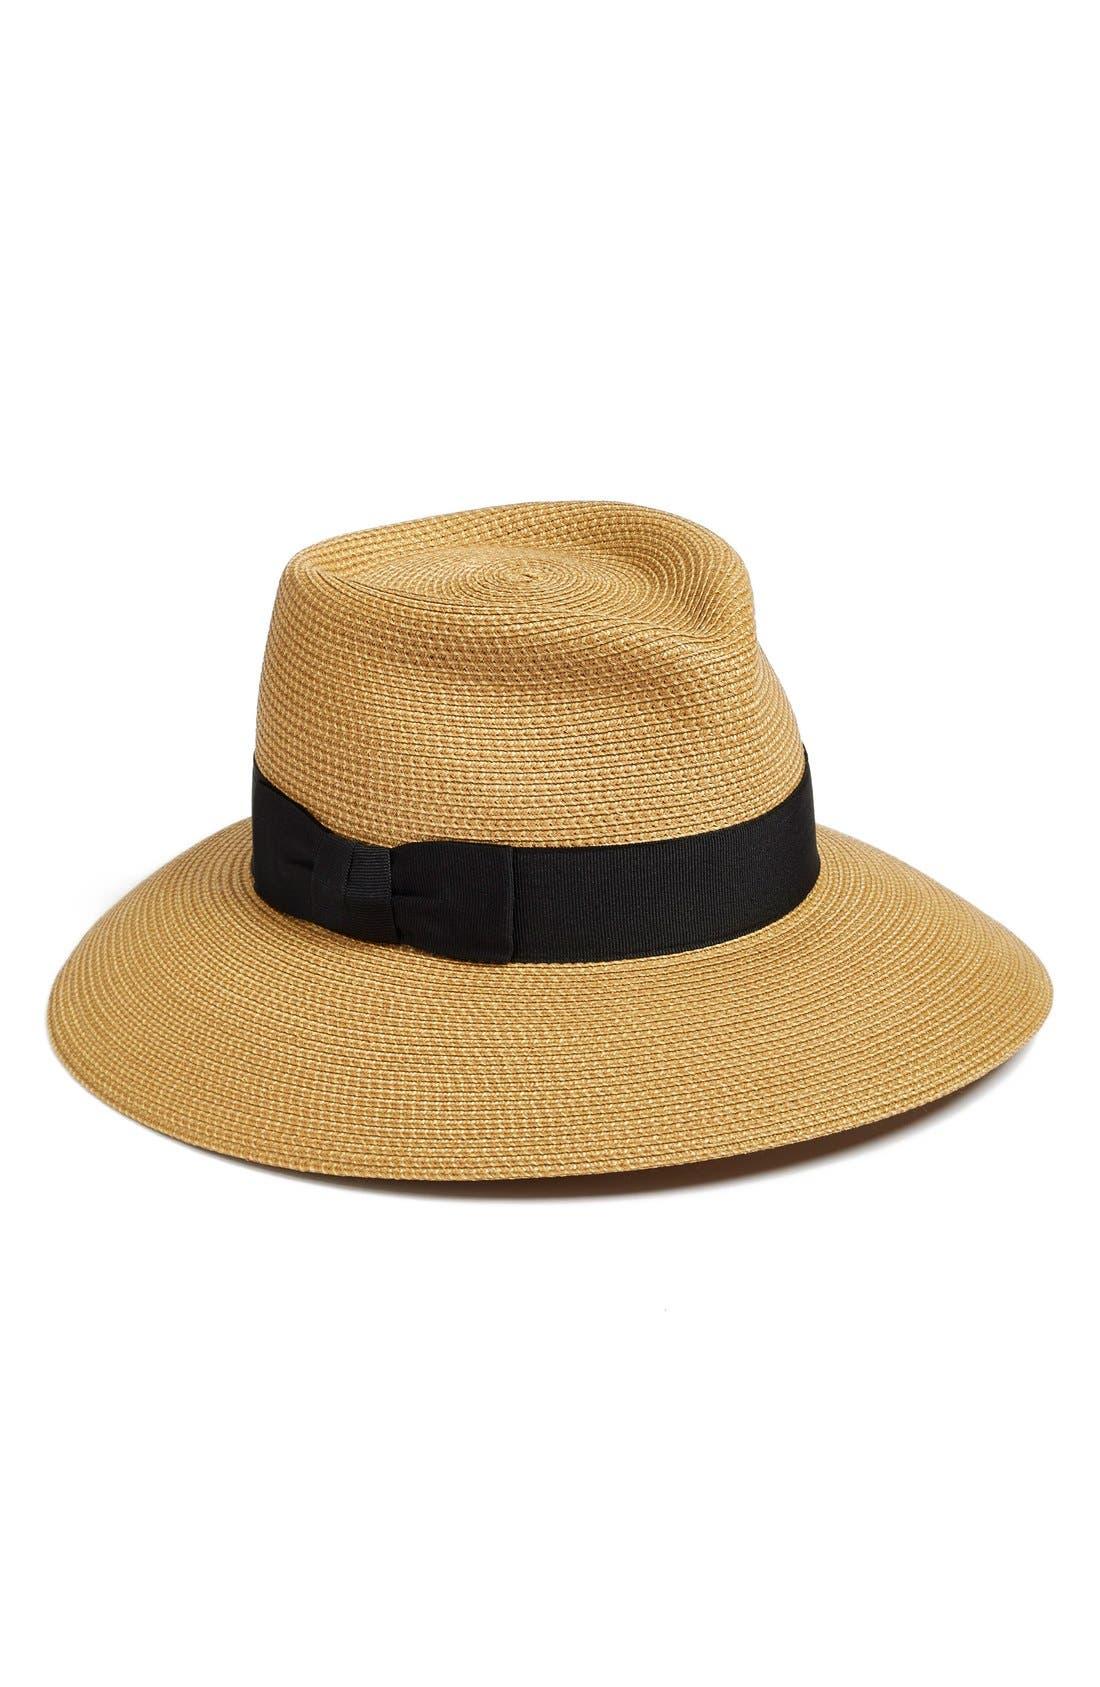 Main Image - Eric Javits 'Phoenix' Packable Fedora Sun Hat